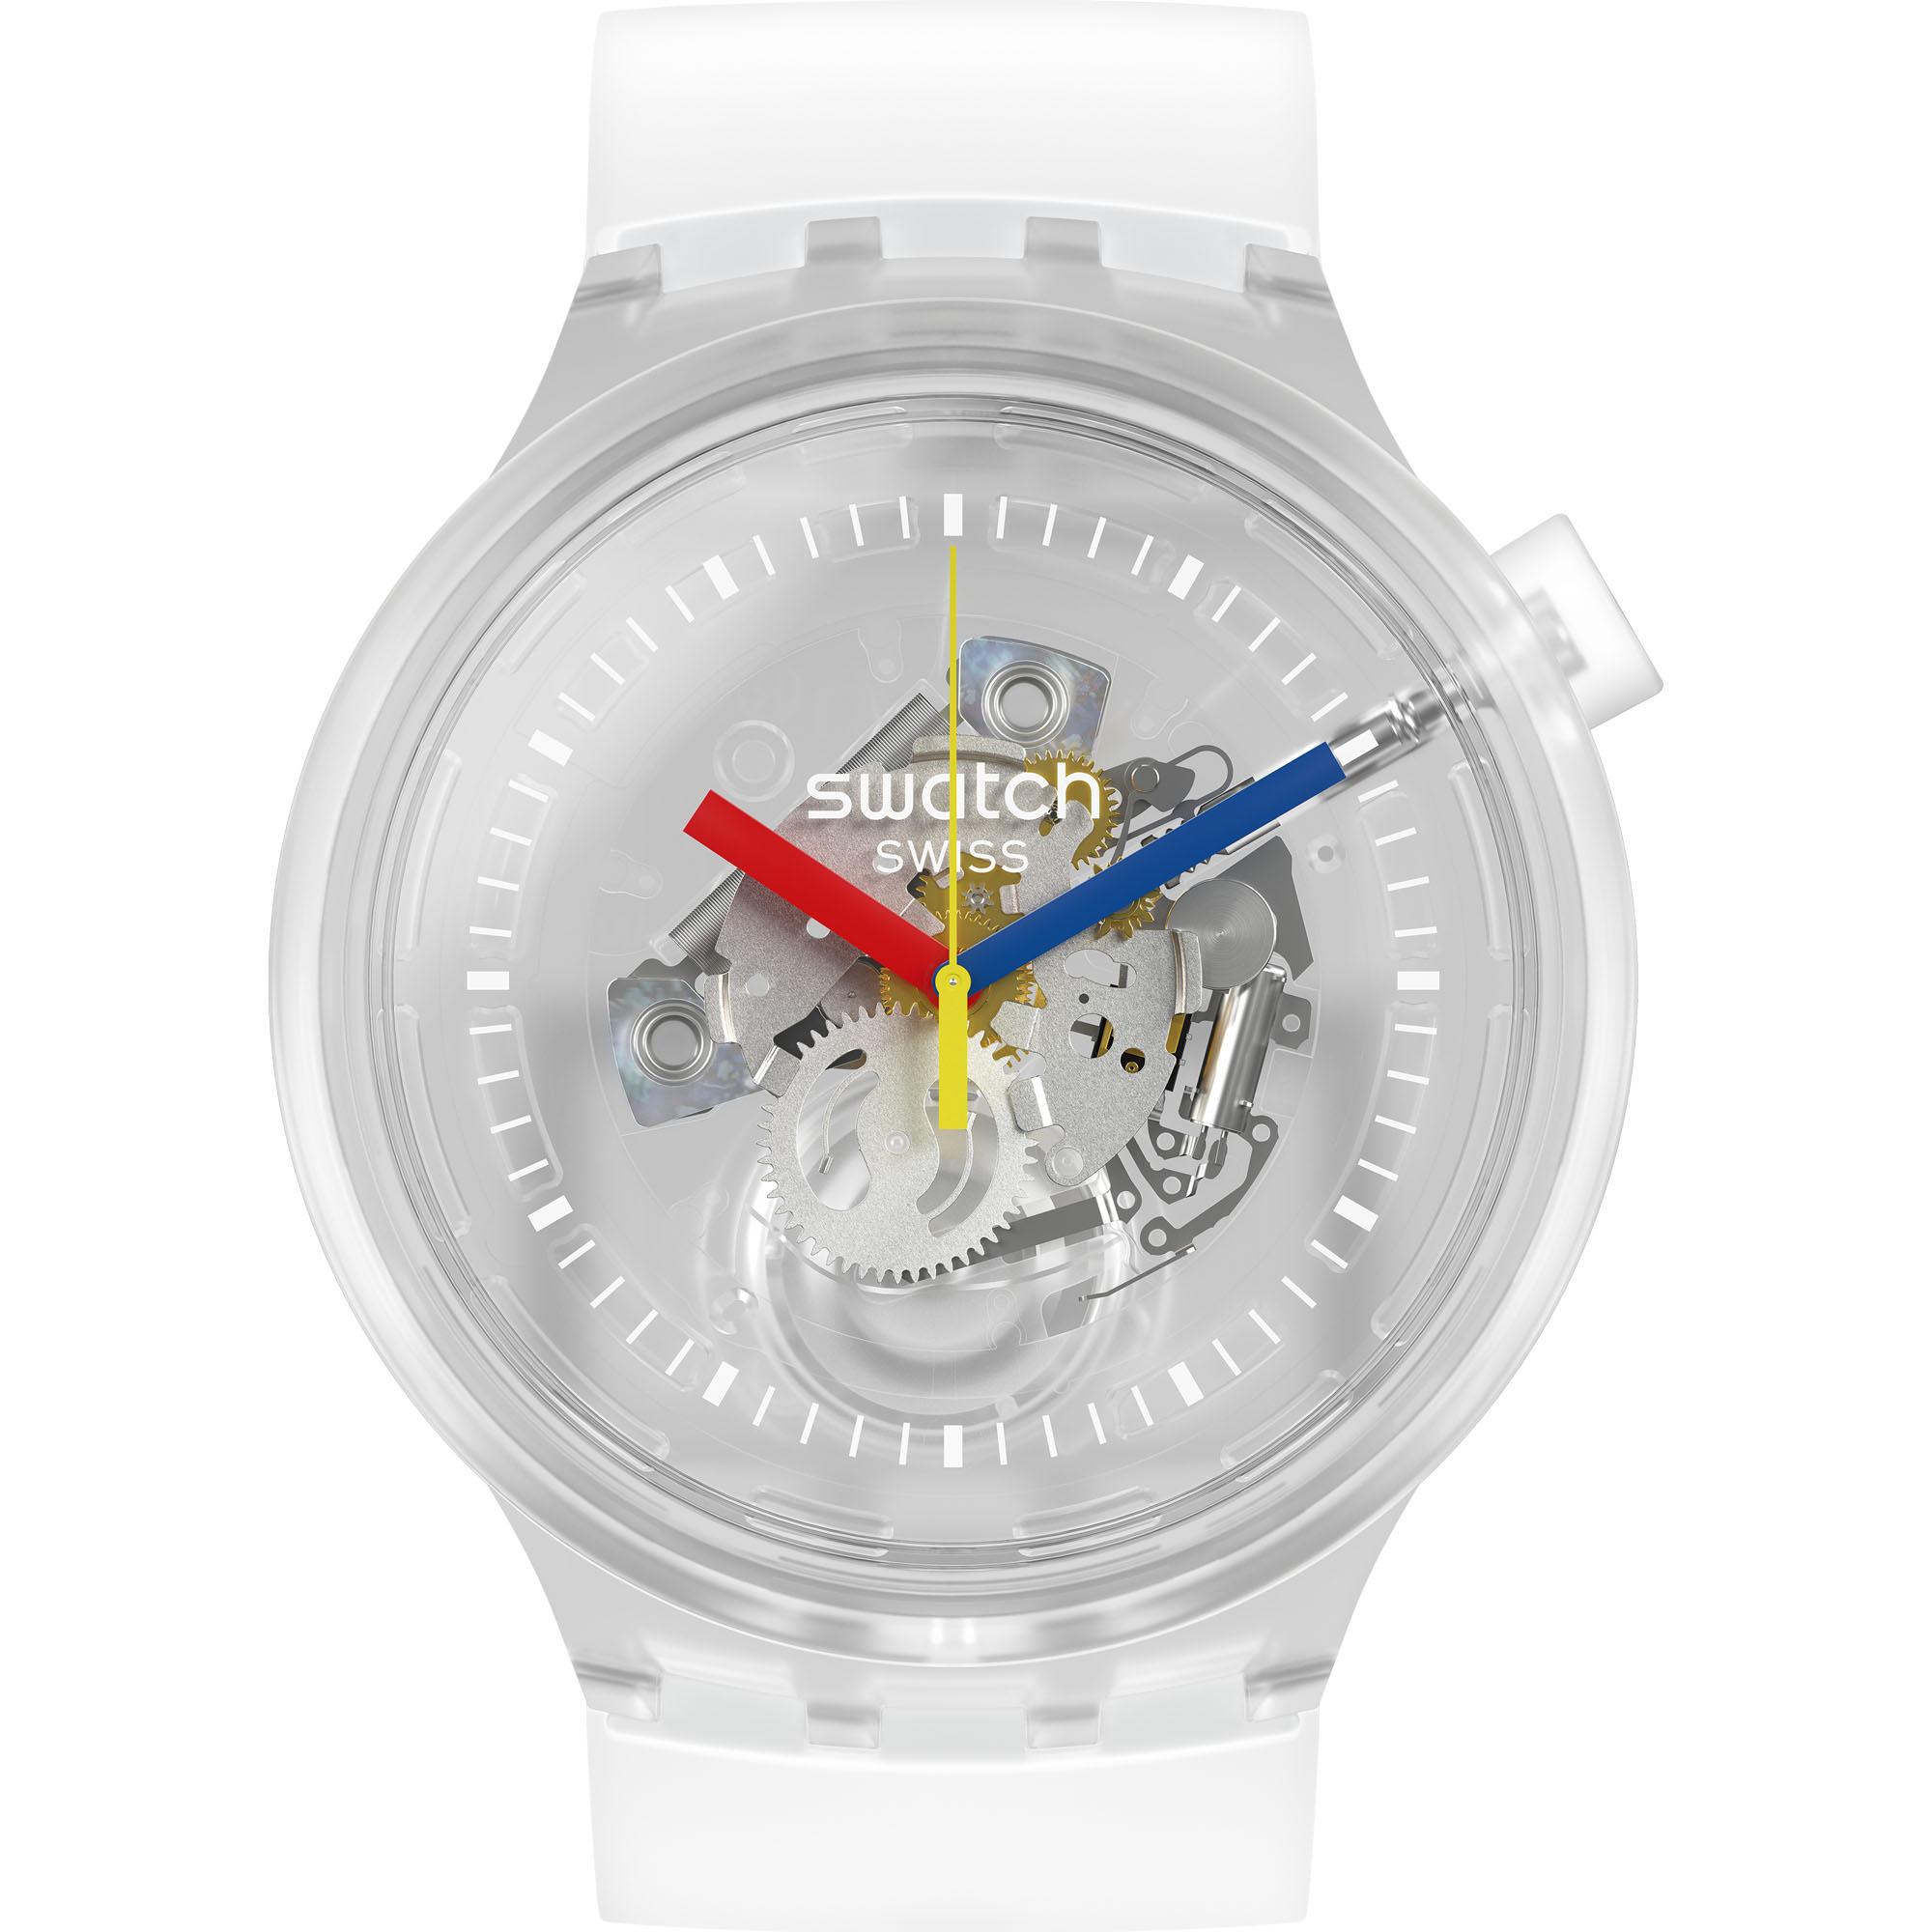 Swatch Big Bold Jellyfish Quartz Skeleton Dial Transparent Silicone Strap Watch SO27E100 RRP £85